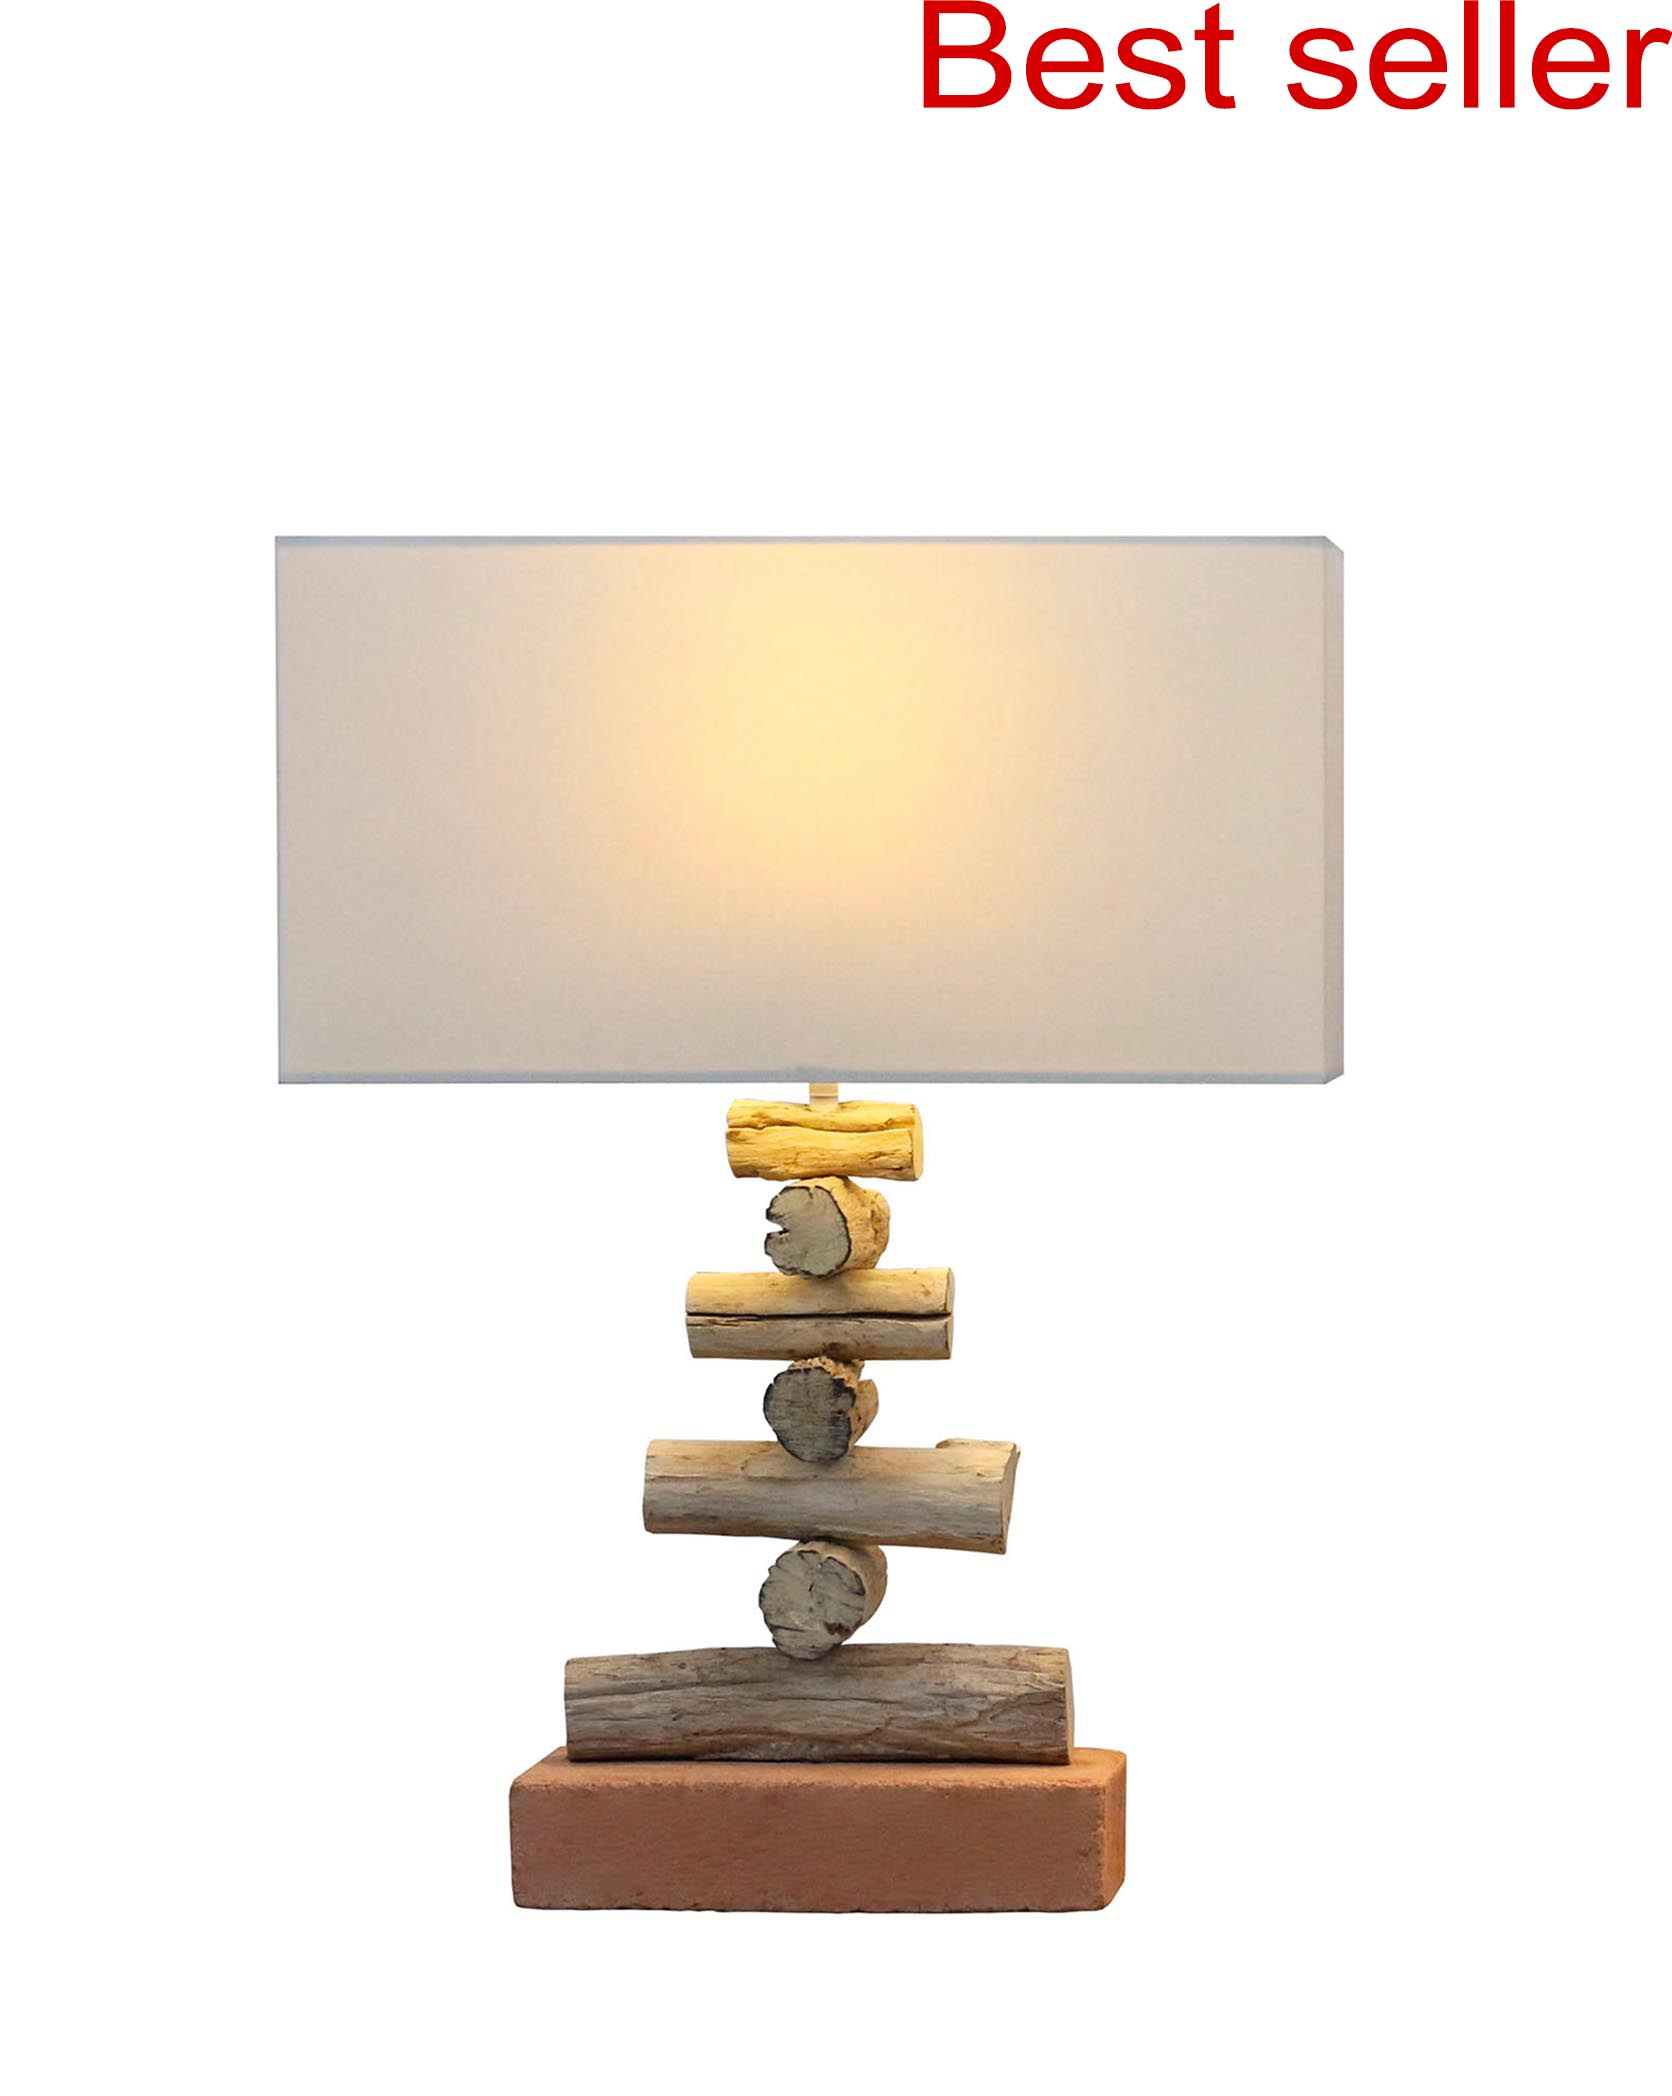 King Mai Sak crossed table lamp product photo #2